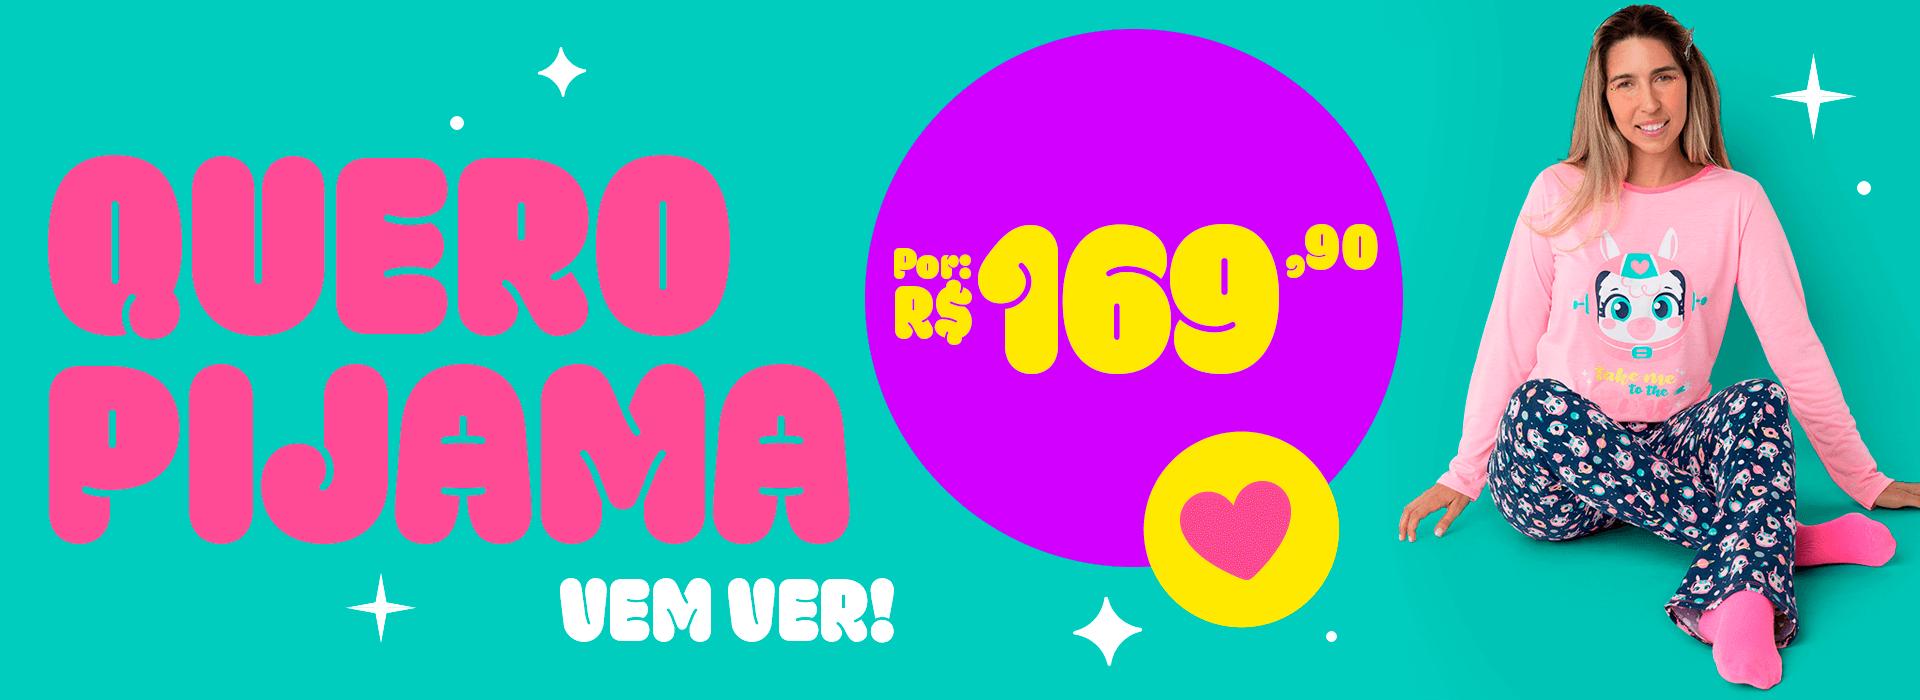 Banner C: Quero Pijama! Por 169,90